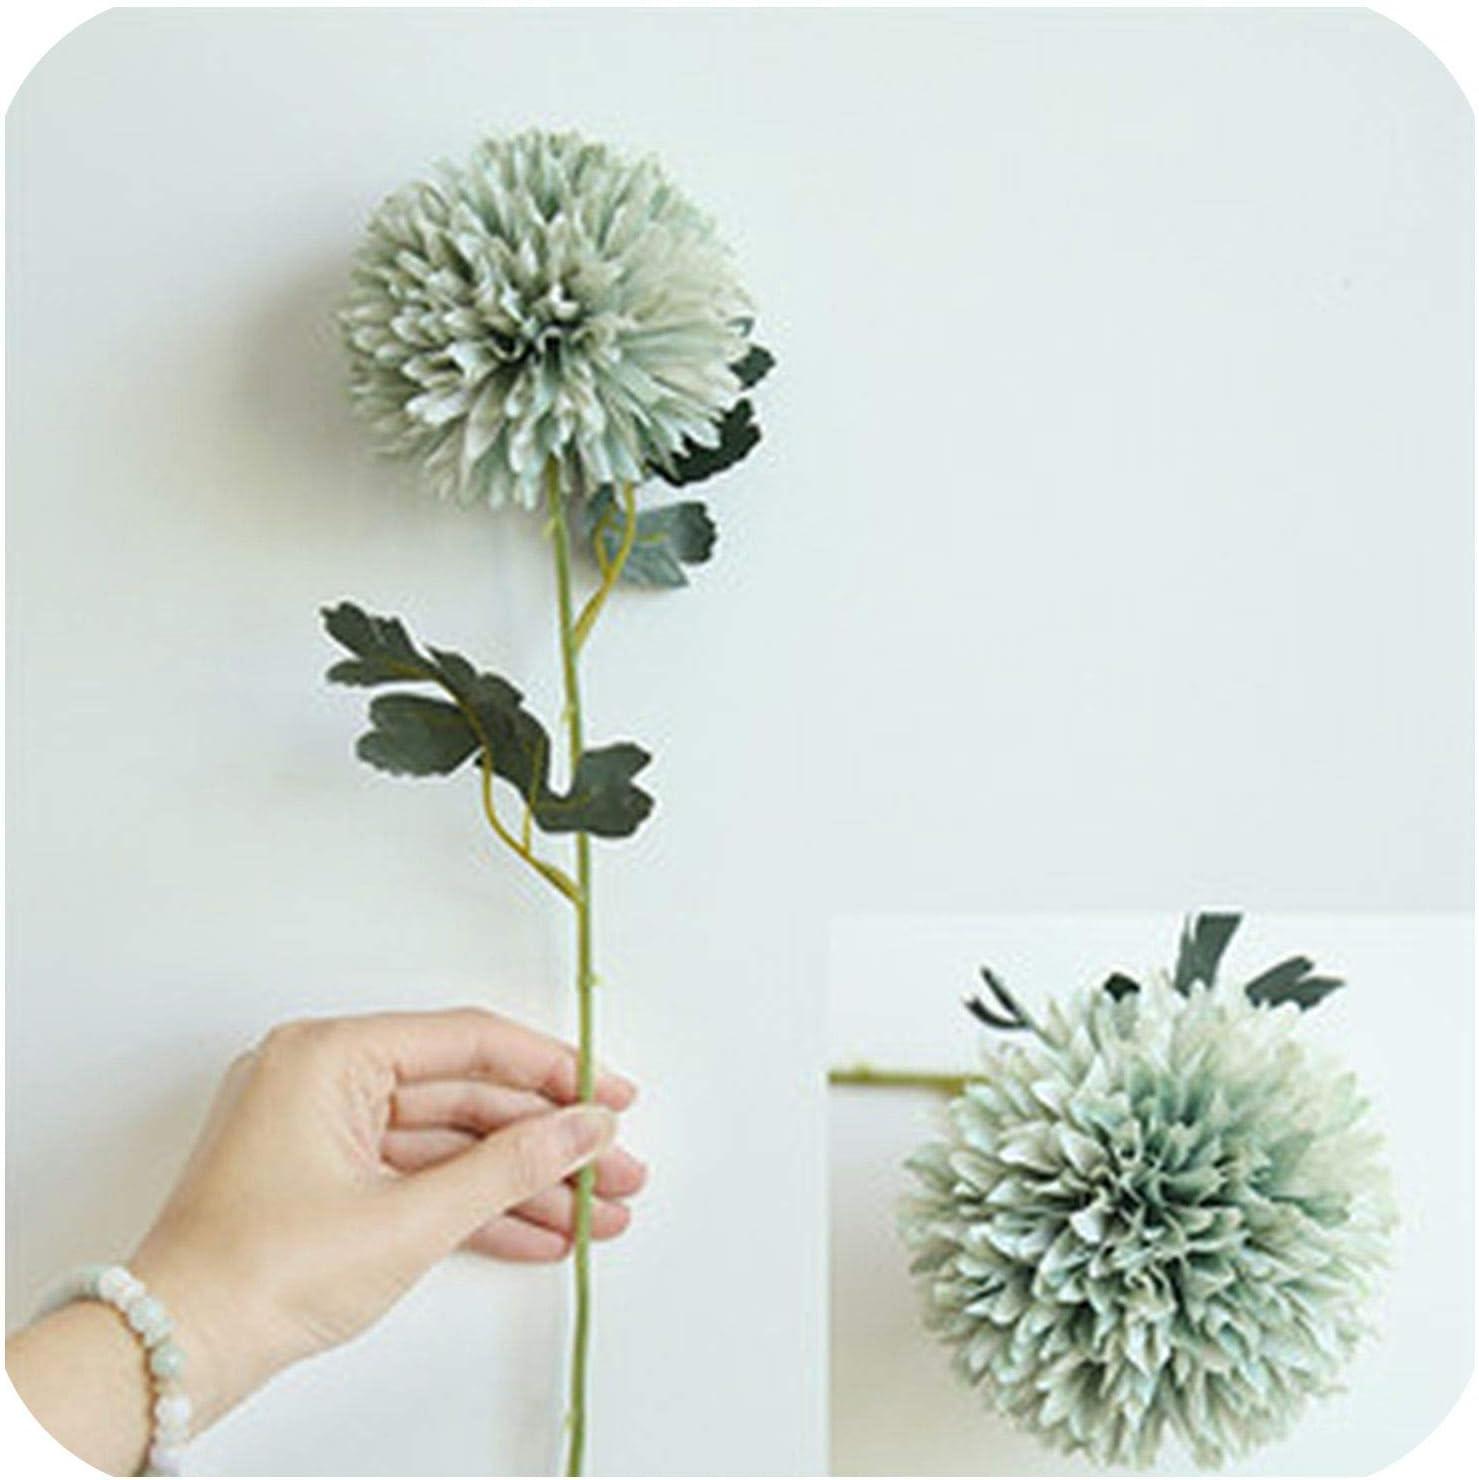 Artificial Flowers Dandelion Silk Fake Plant Branch Wedding Home Floral Decor